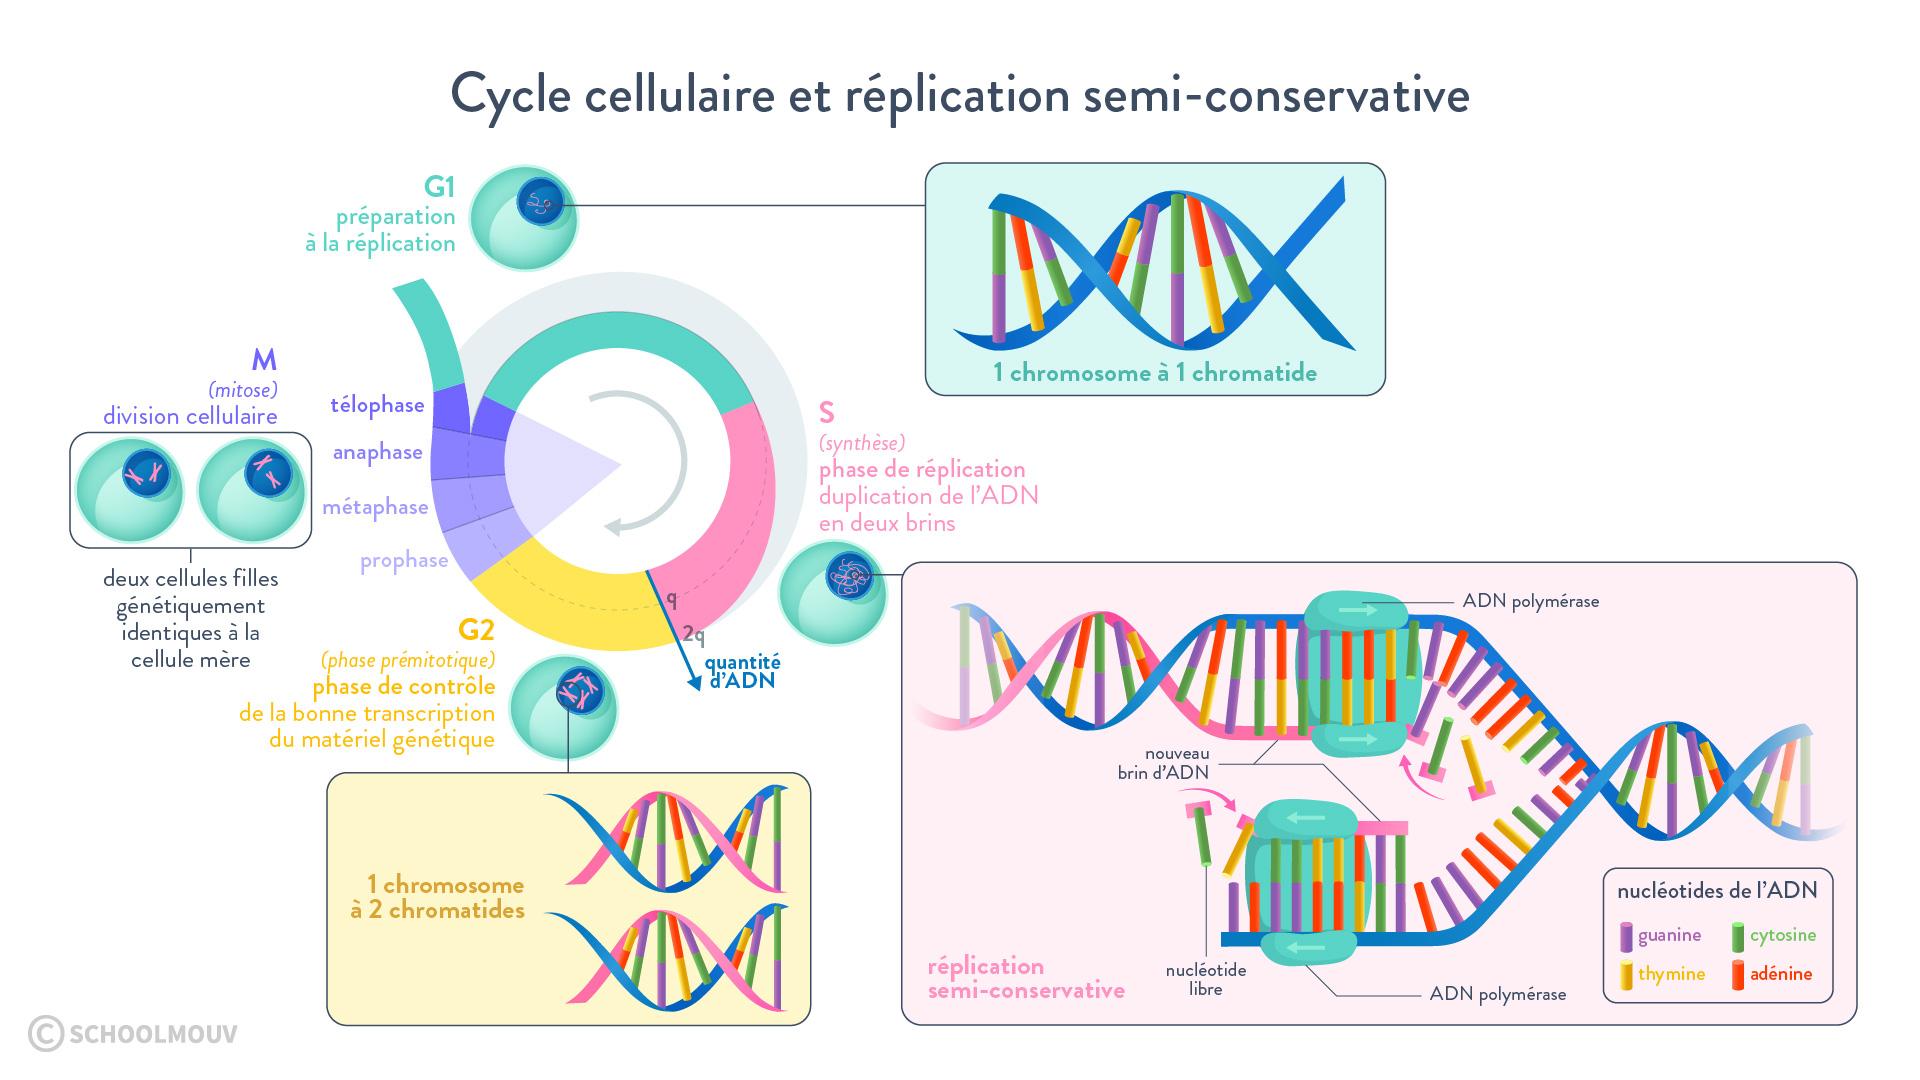 mitose cycle cellulaire réplication semi-conservative ADN polymérase